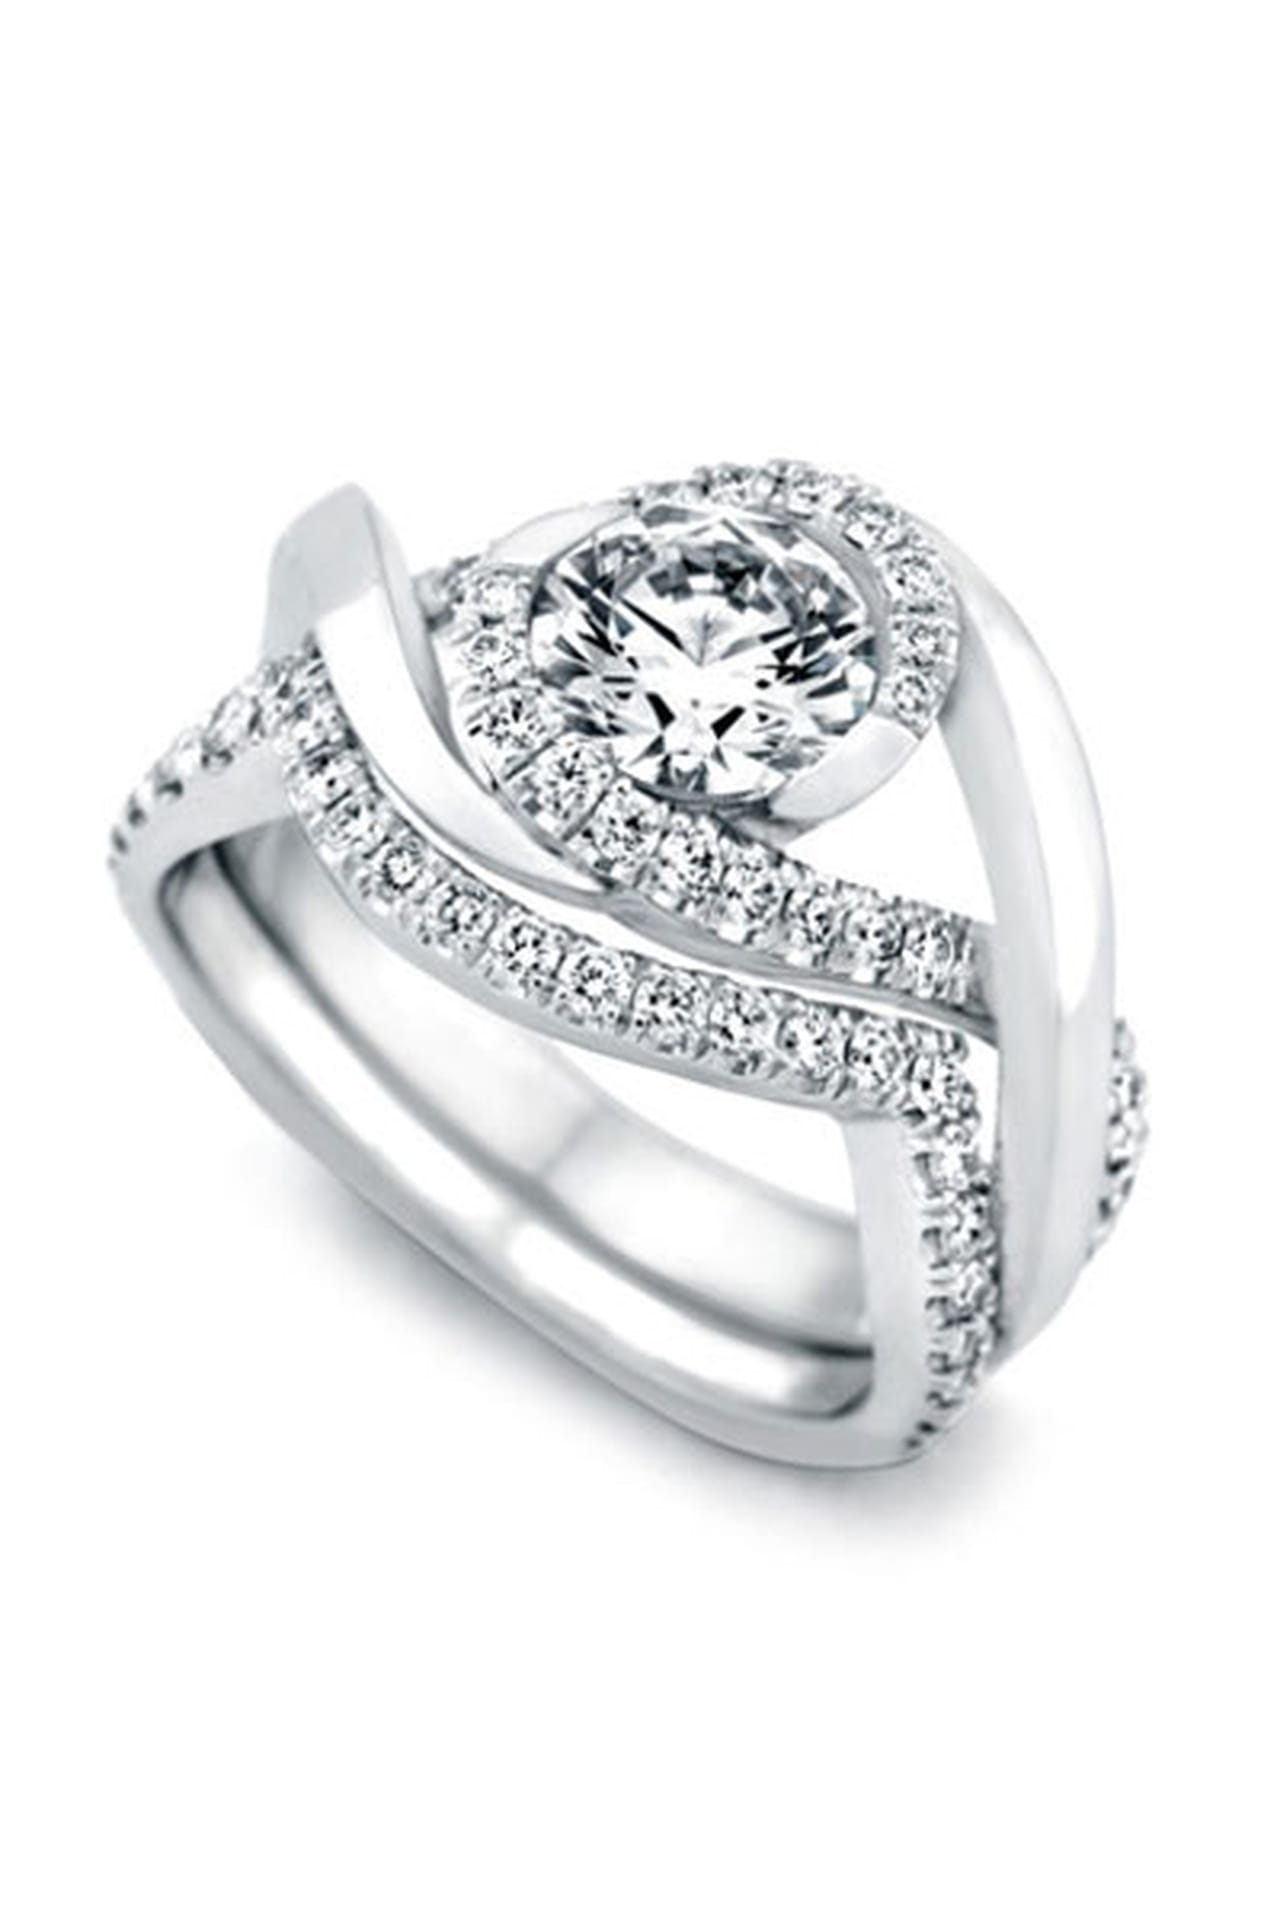 061cd080b خواتم زفاف من أهم الماركات العالمية